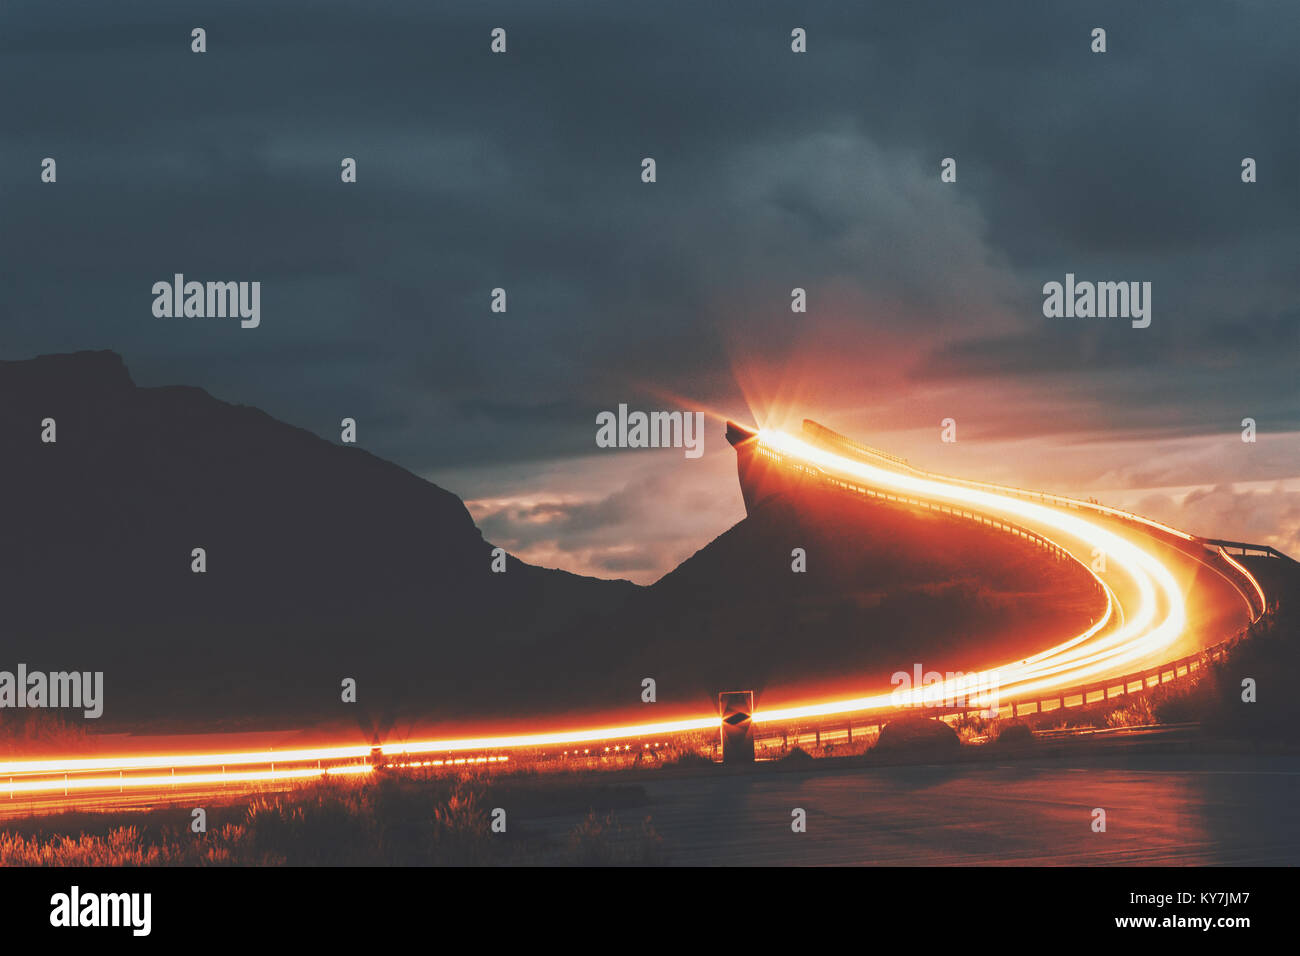 Atlantic Road in Norwegen nacht Storseisundet Brücke über das Meer weg zum Himmel skandinavische reisen Stockbild